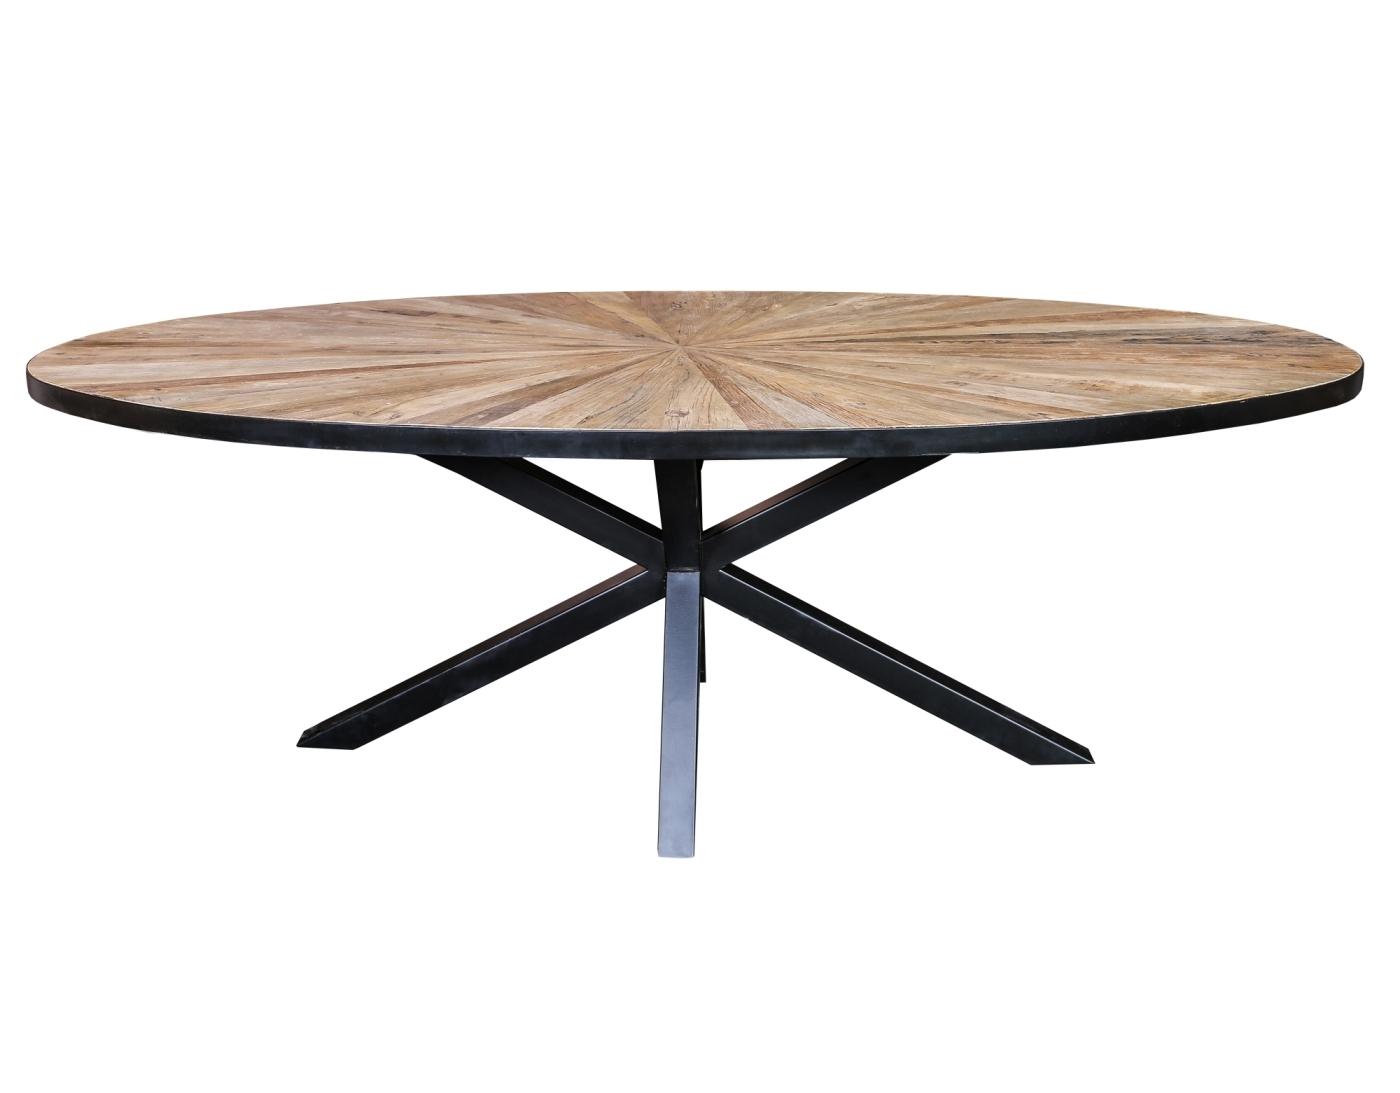 Cleme ovale Elm wood diningtable black iron base PTMD